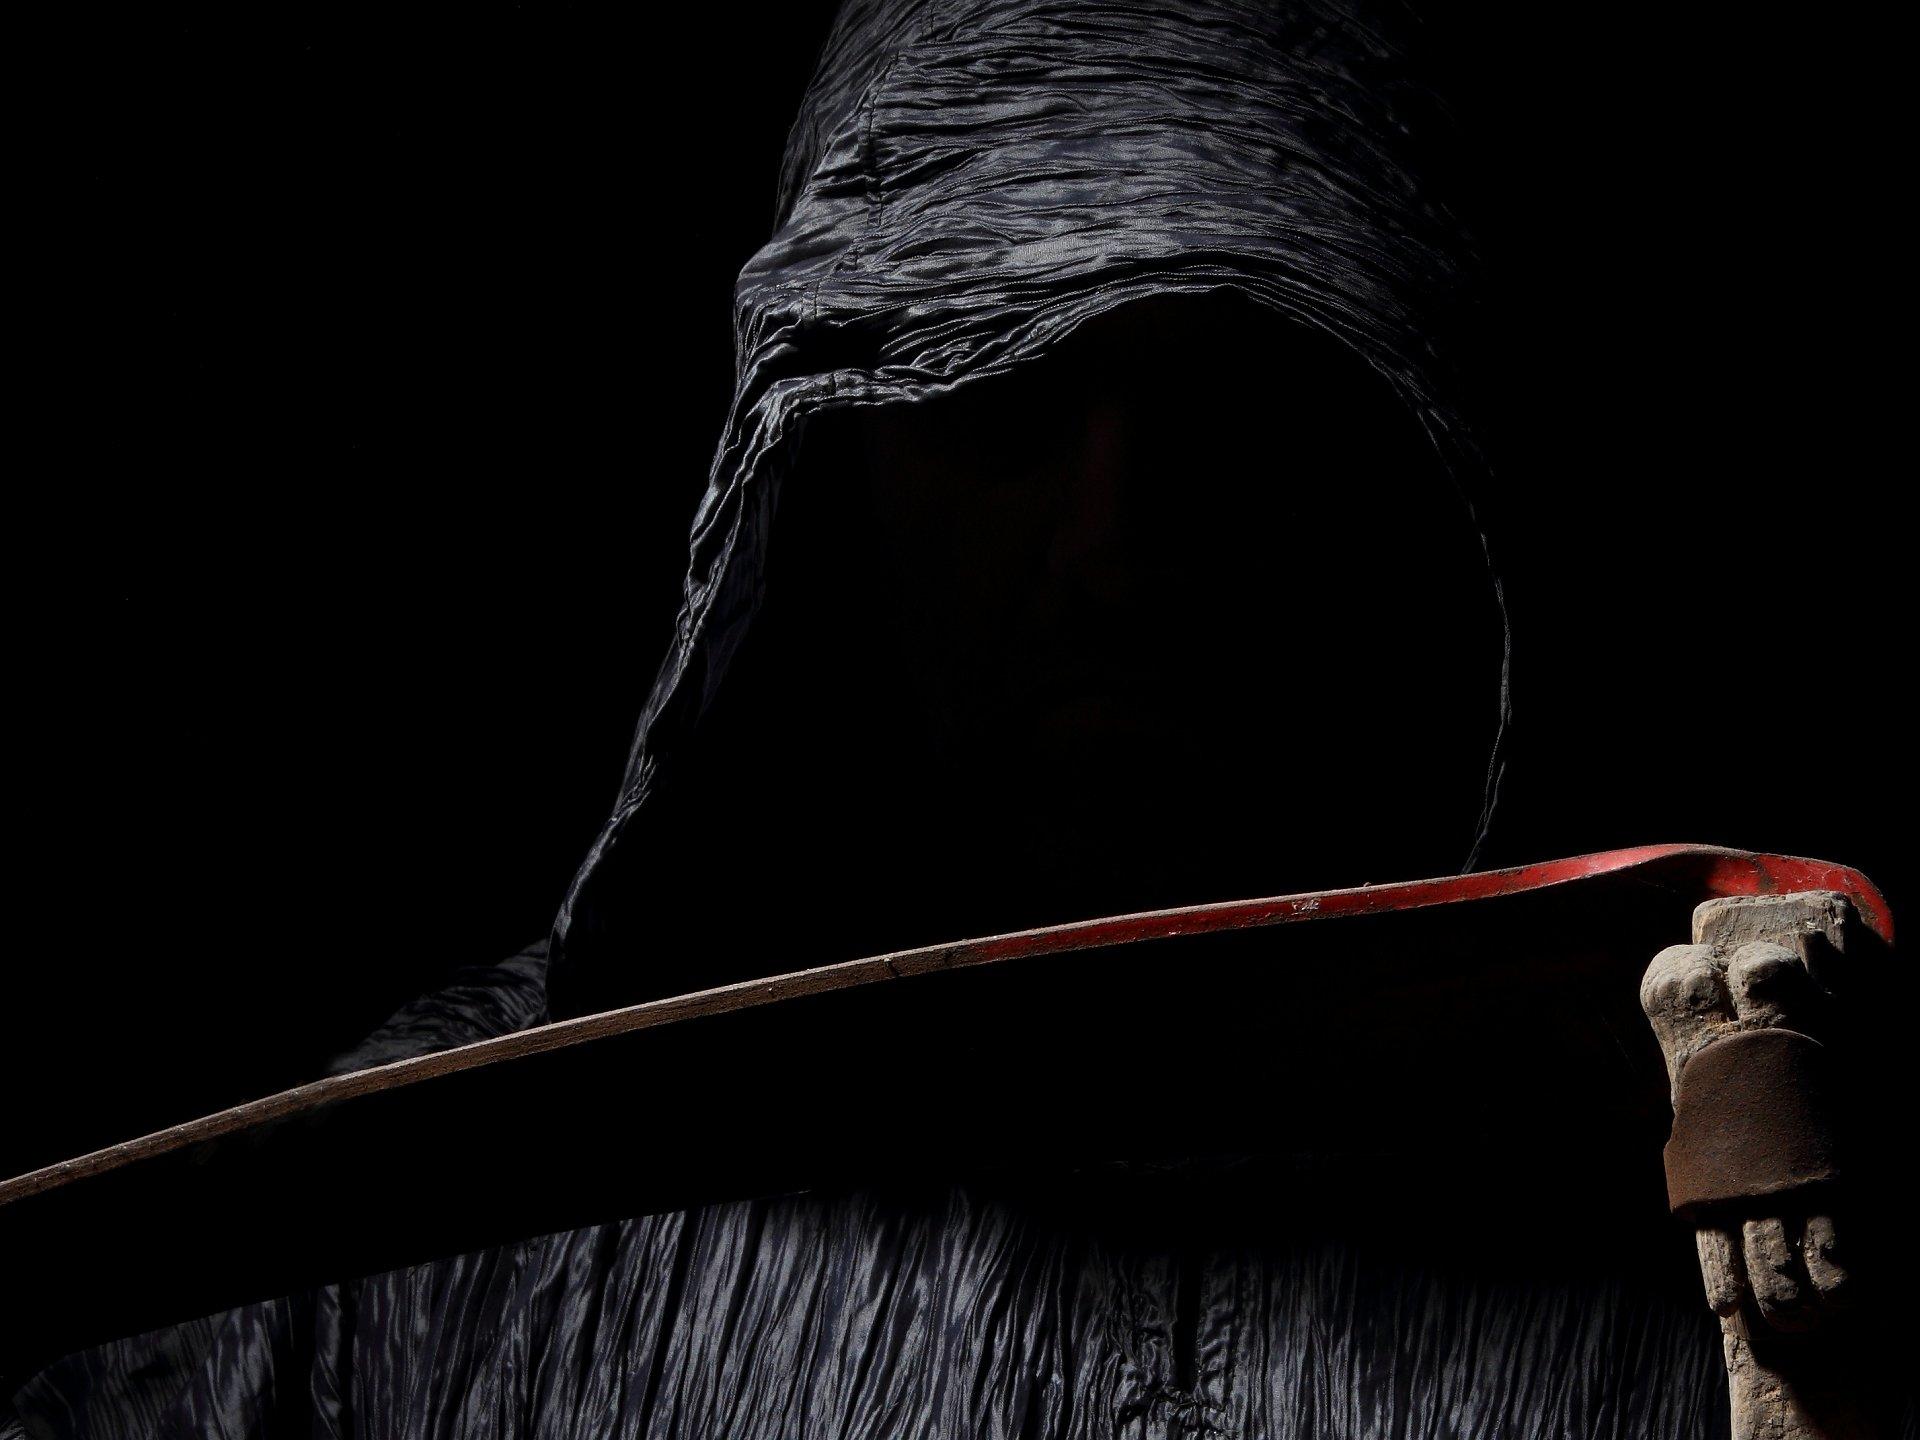 Death Grim Reaper wallpaper 1920x1440 247942 WallpaperUP 1920x1440